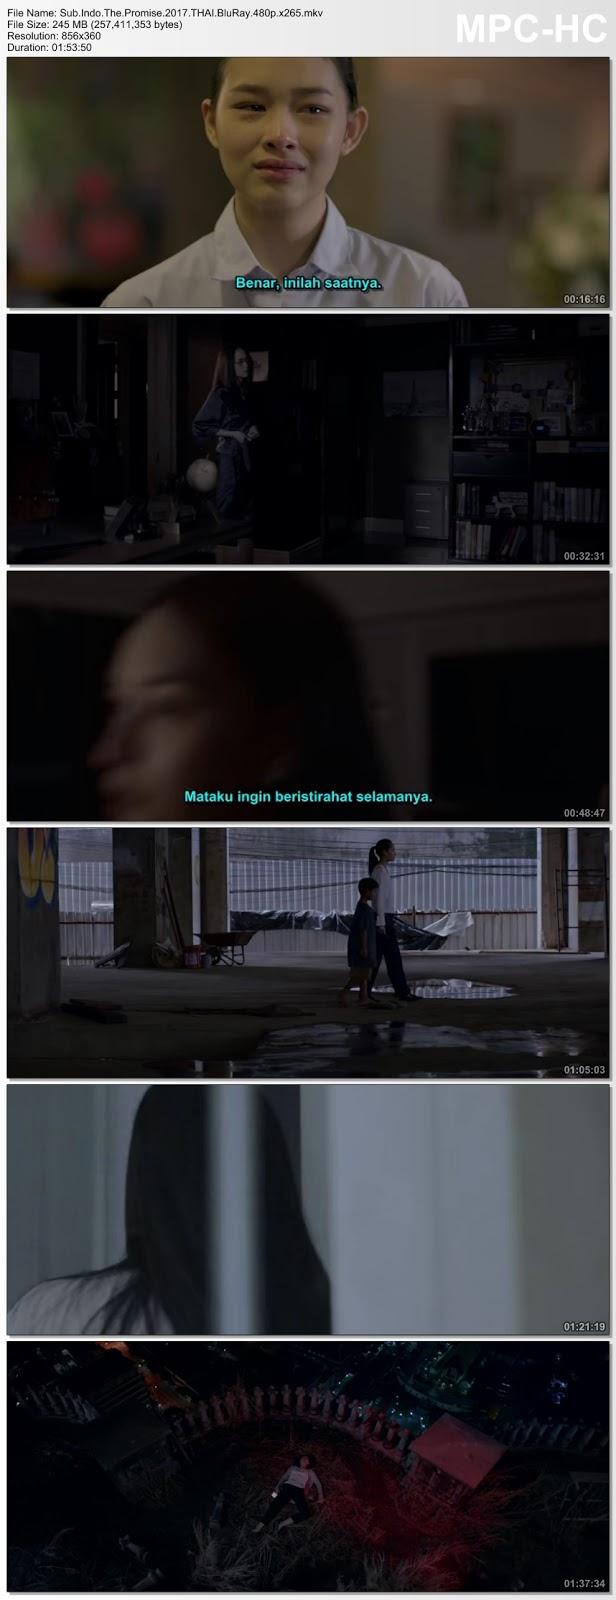 Screenshots Movie Sub.Indo.Puen Tee Raluek aka Obietnica aka The Promise.2017.BluRay.480p.x265.mkv